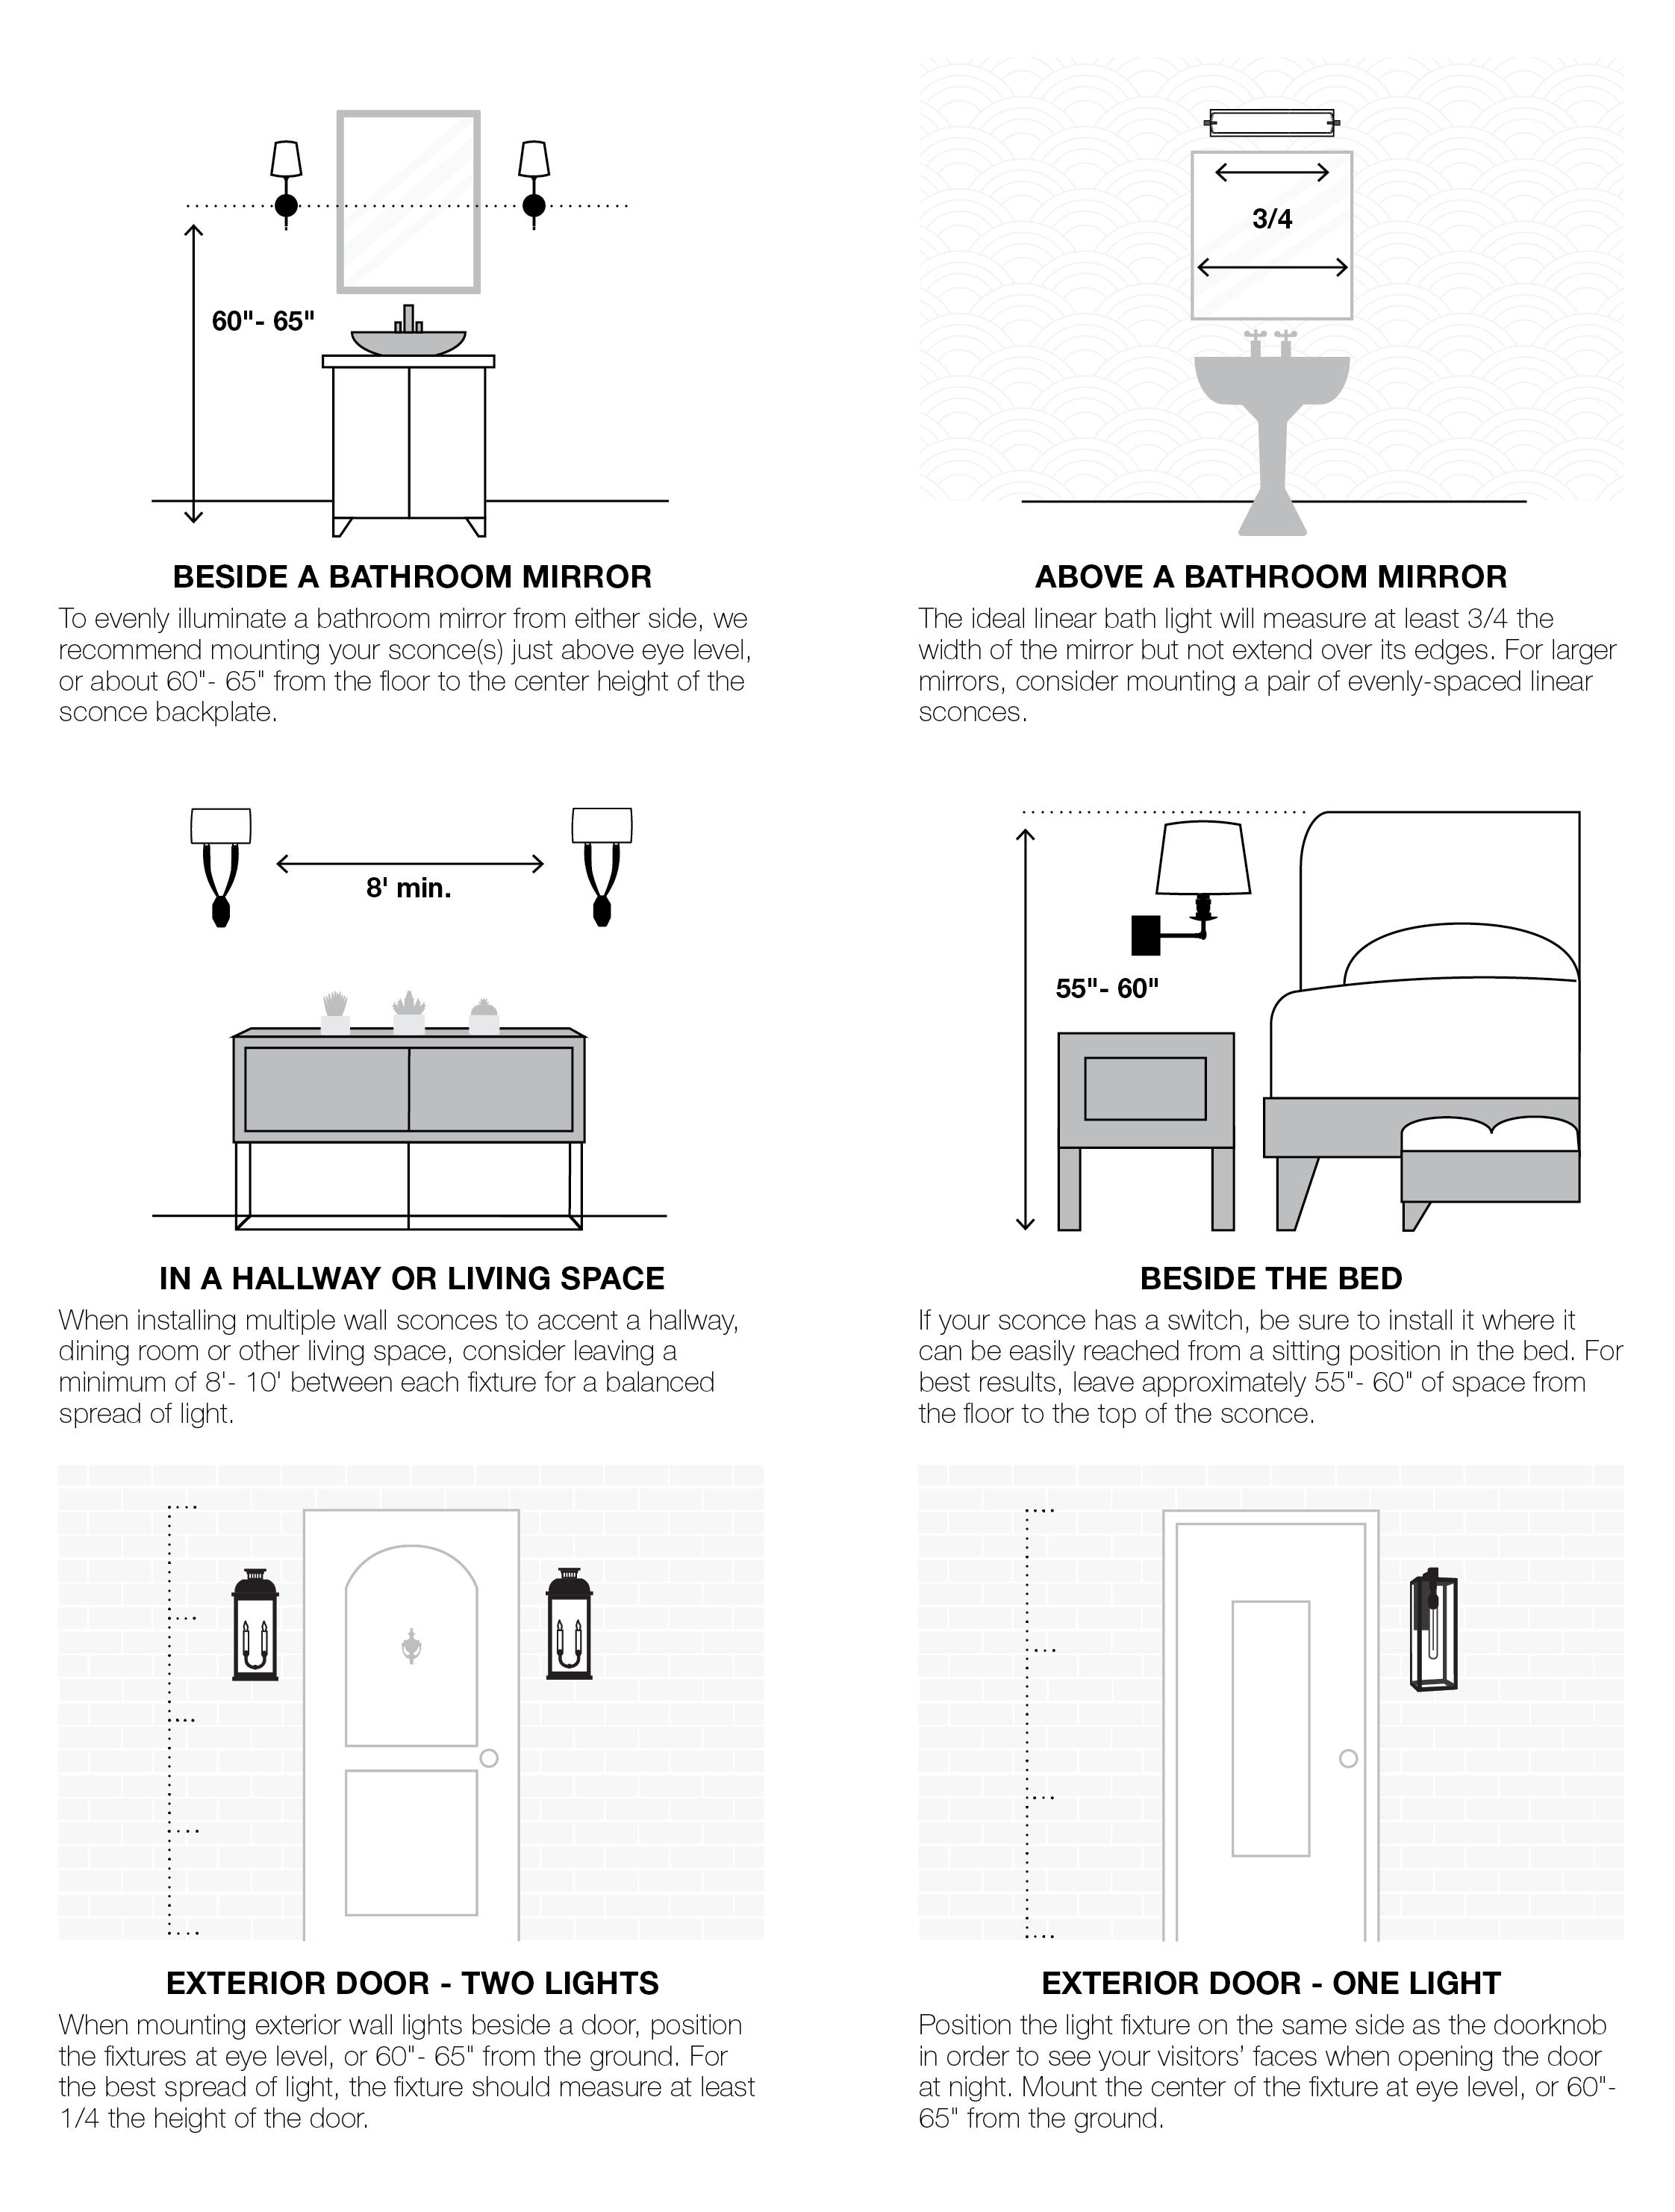 Wall Tips In 2020 Interior Design Guide Bathroom Sconces Interior Design Tips